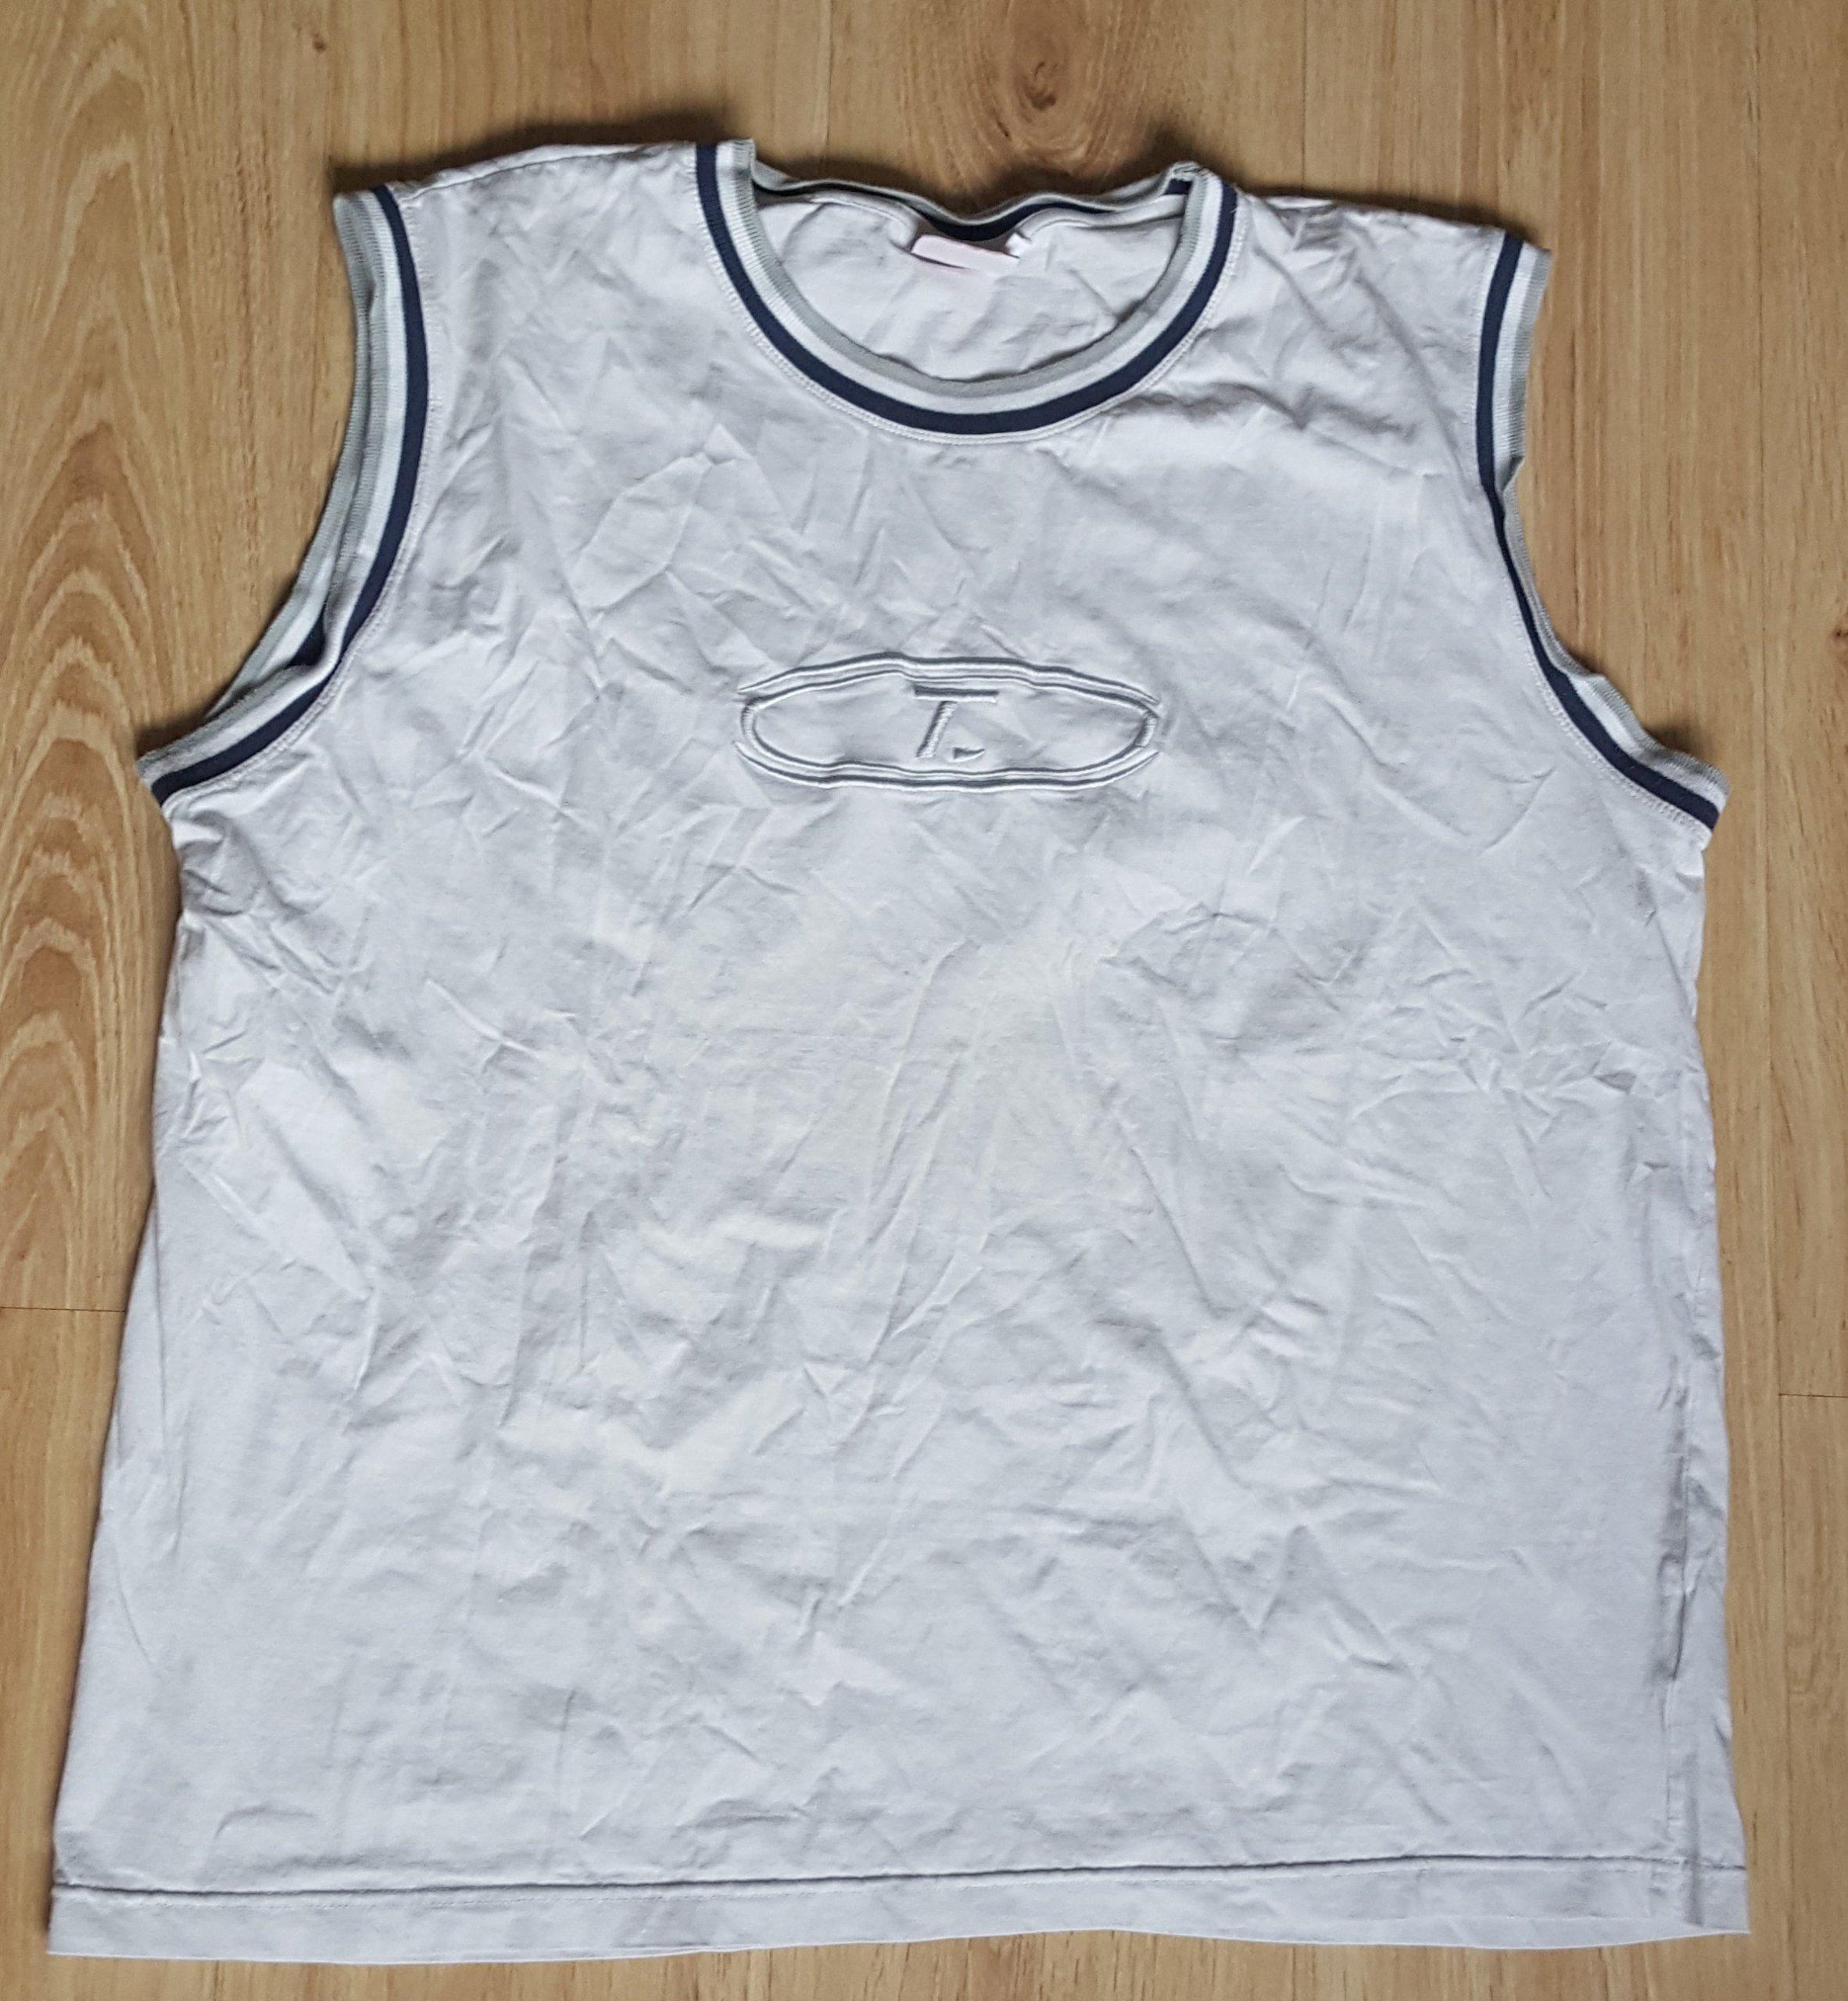 REWARD roz XXXL 3XL T-Shirt